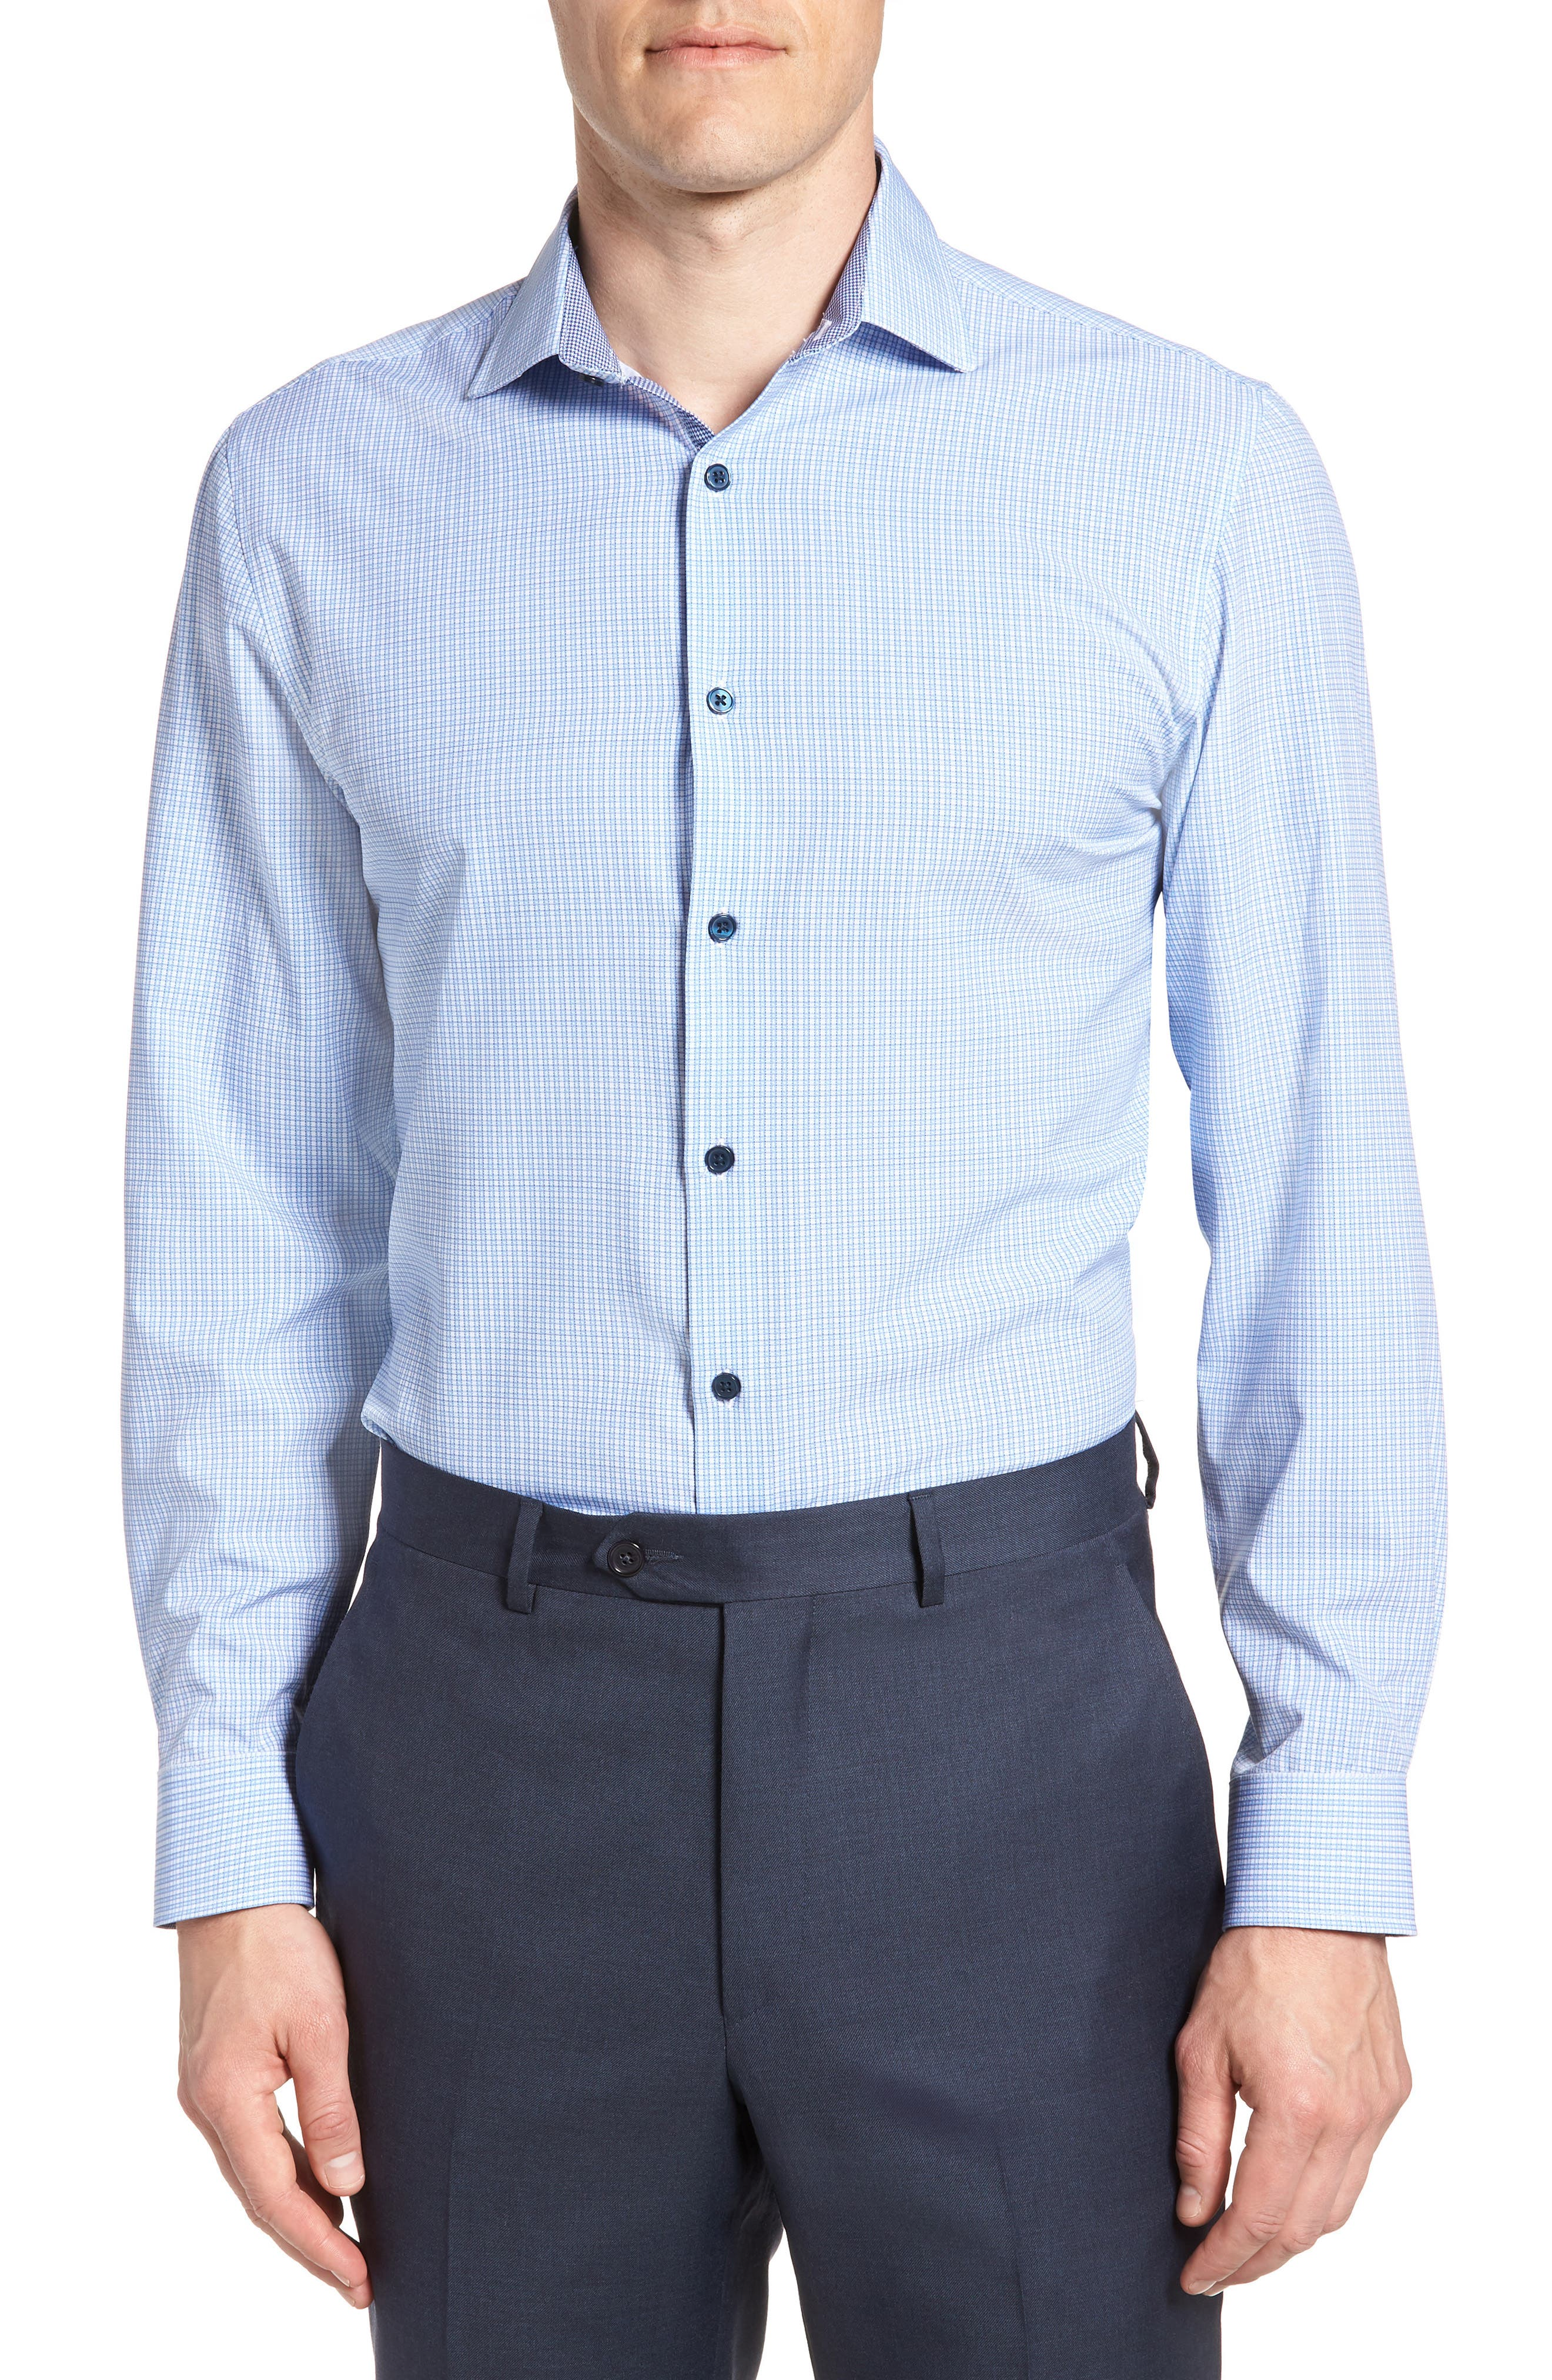 Trim Fit Check 4-Way Stretch Dress Shirt,                             Main thumbnail 1, color,                             BLUE